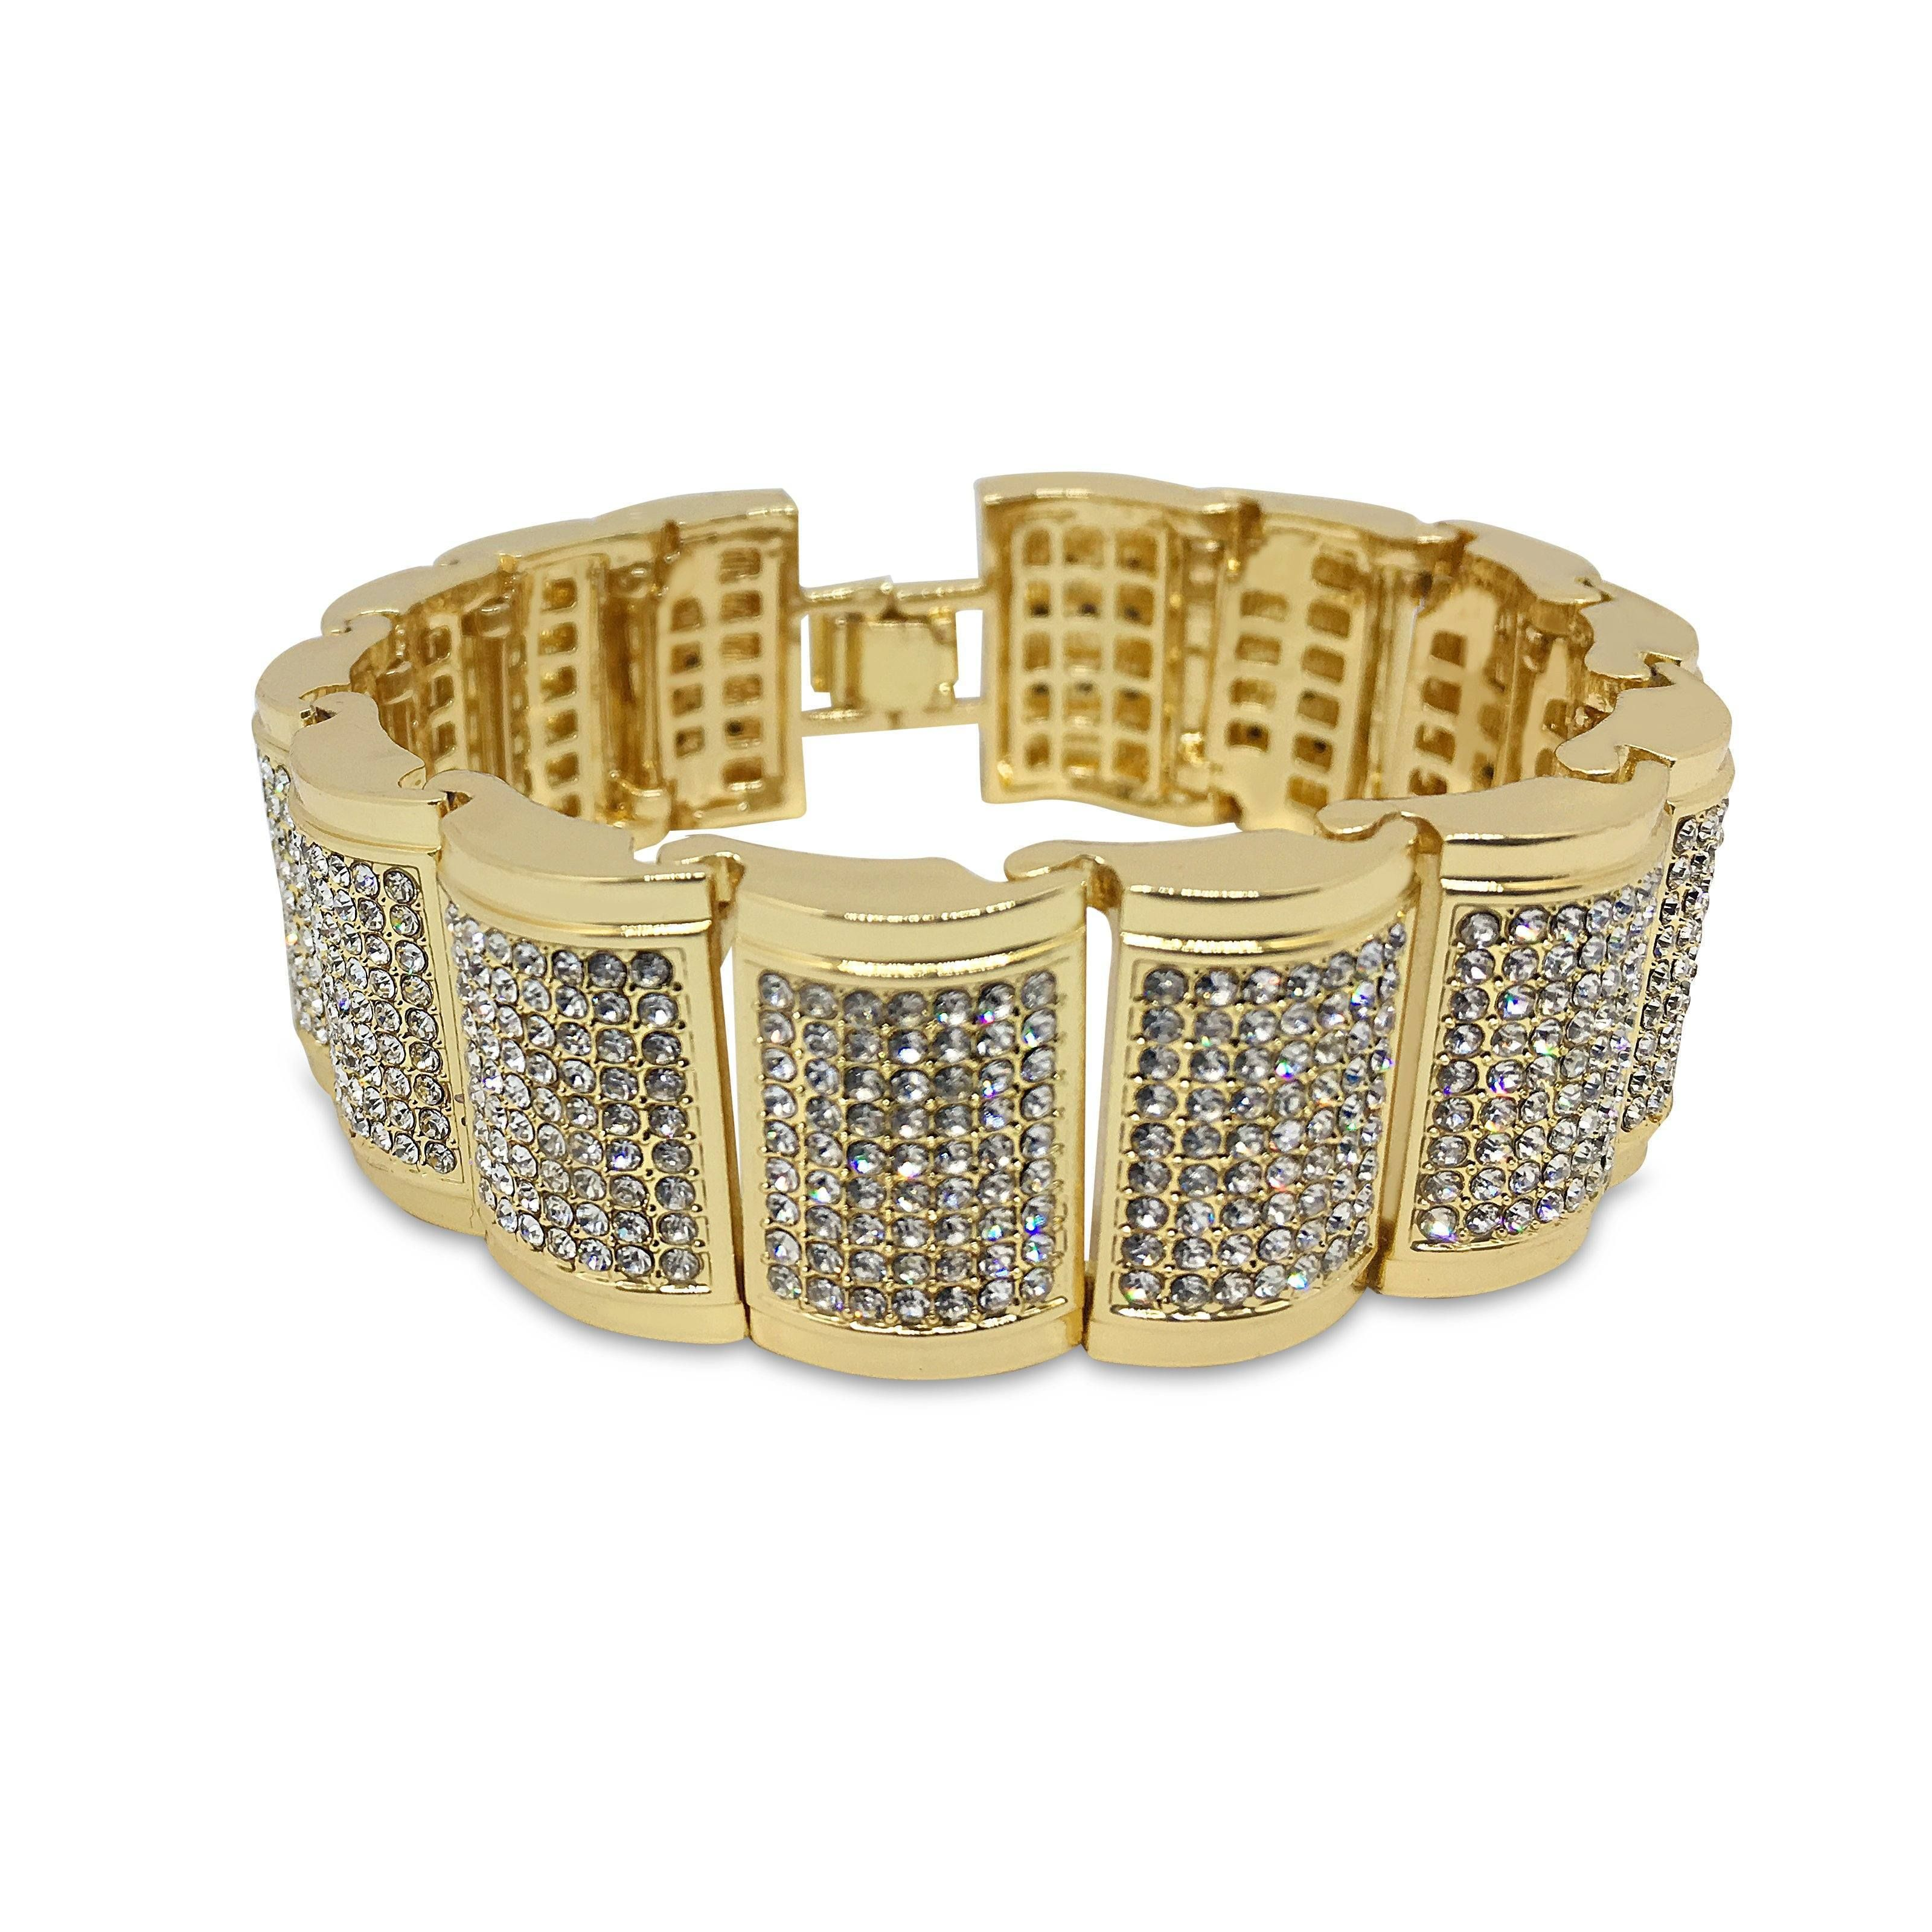 Cz crystals inlaid gold finish bracelet pinterest hip hop bling